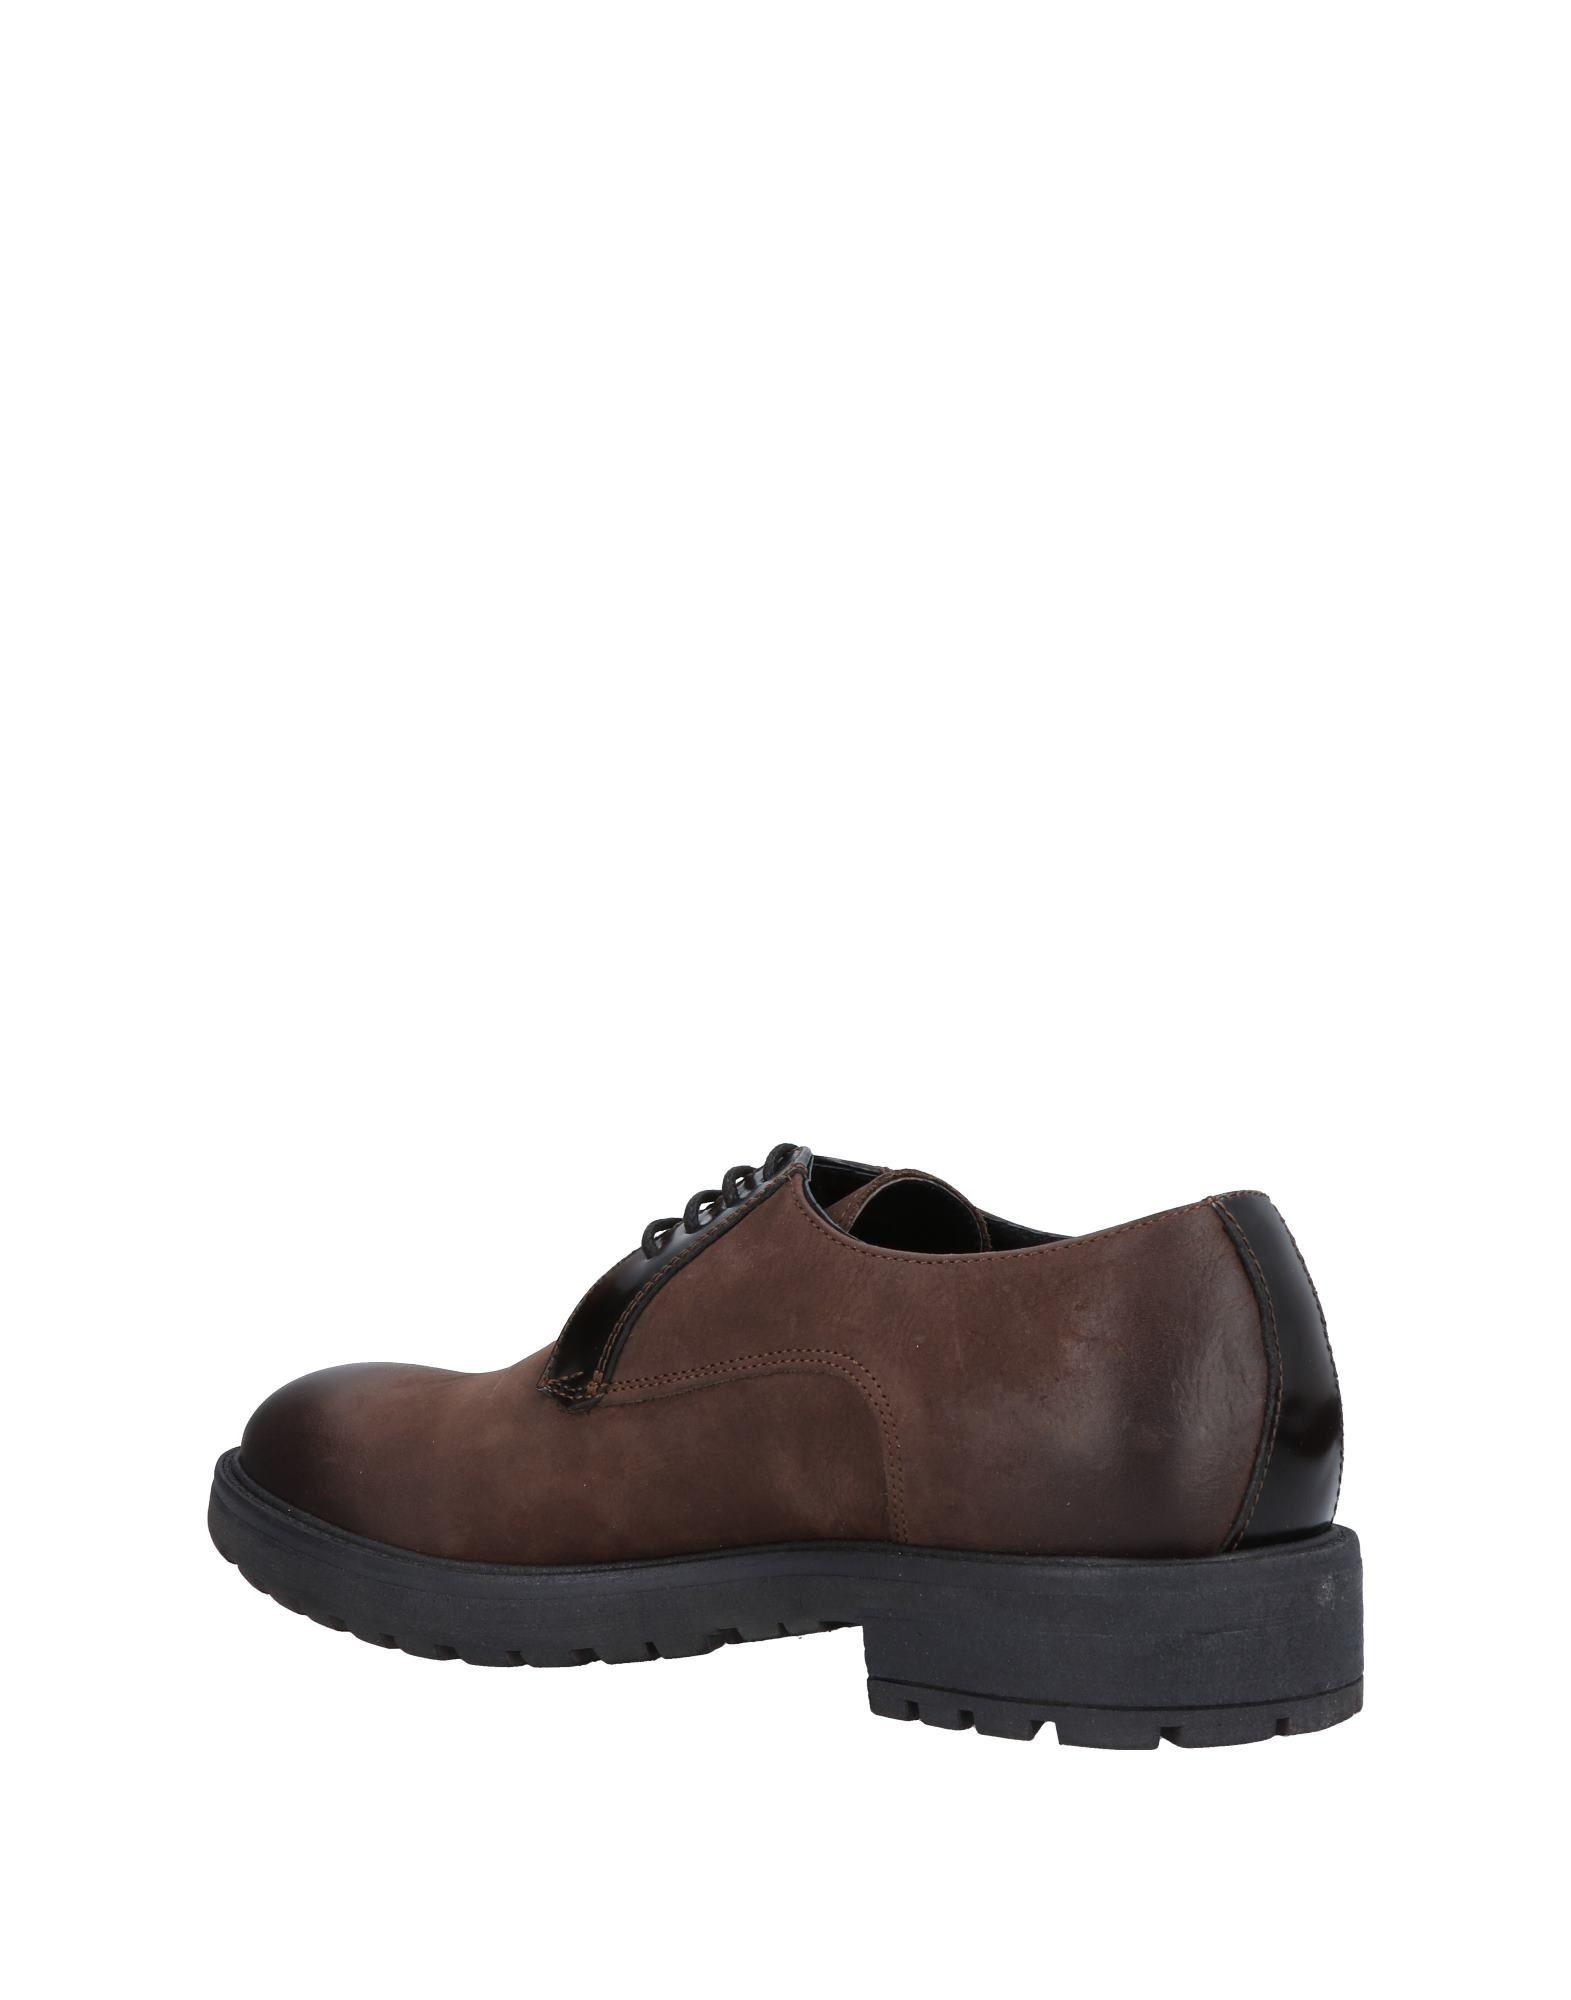 Rabatt Herren echte Schuhe Exibit Schnürschuhe Herren Rabatt  11465336NQ 3c29db